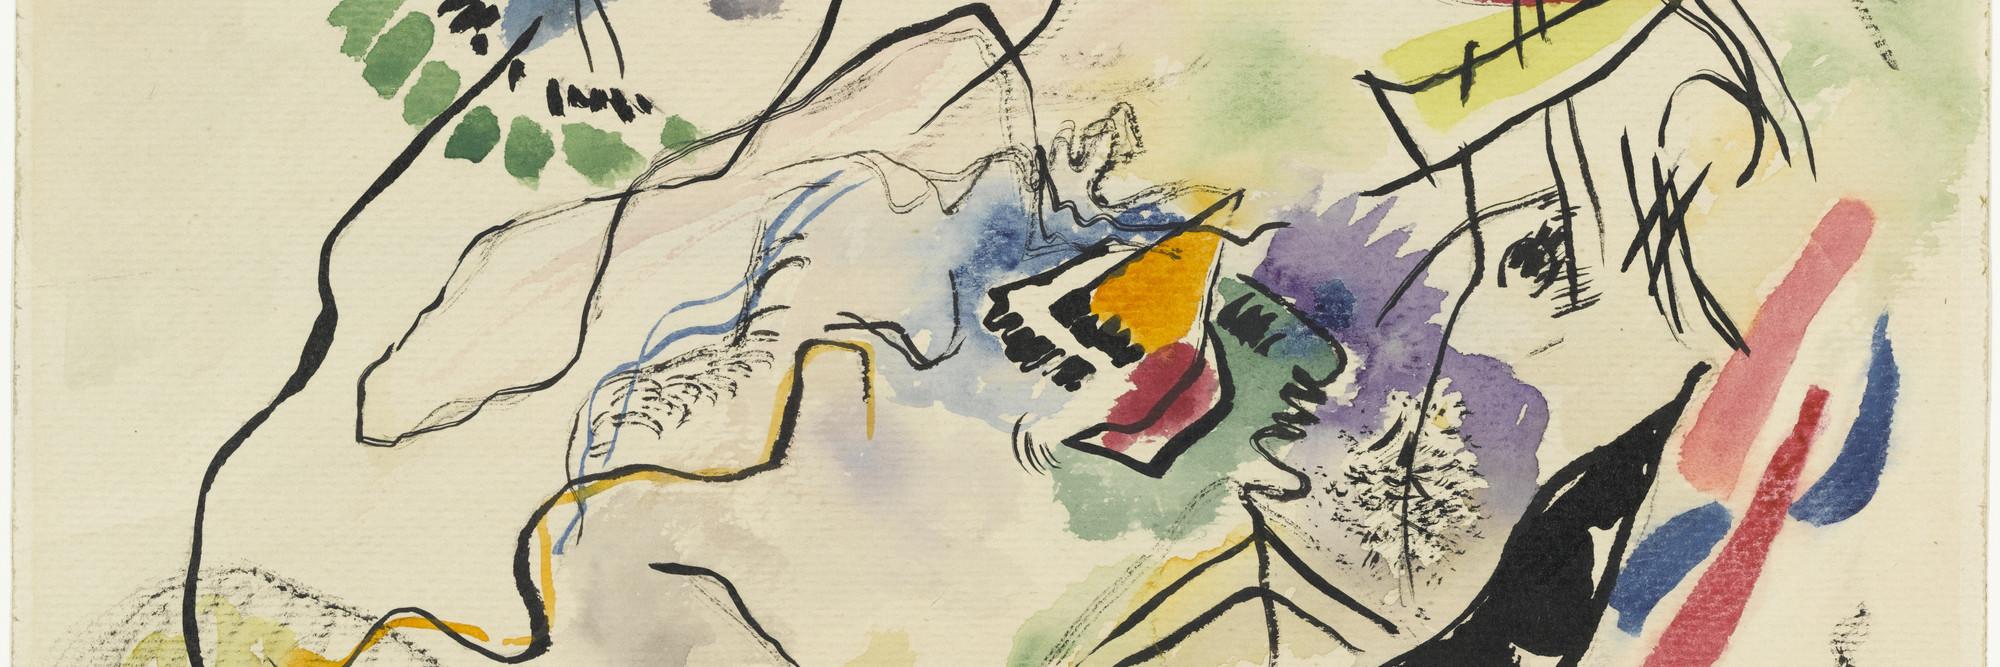 Kandinsky Compositions Moma